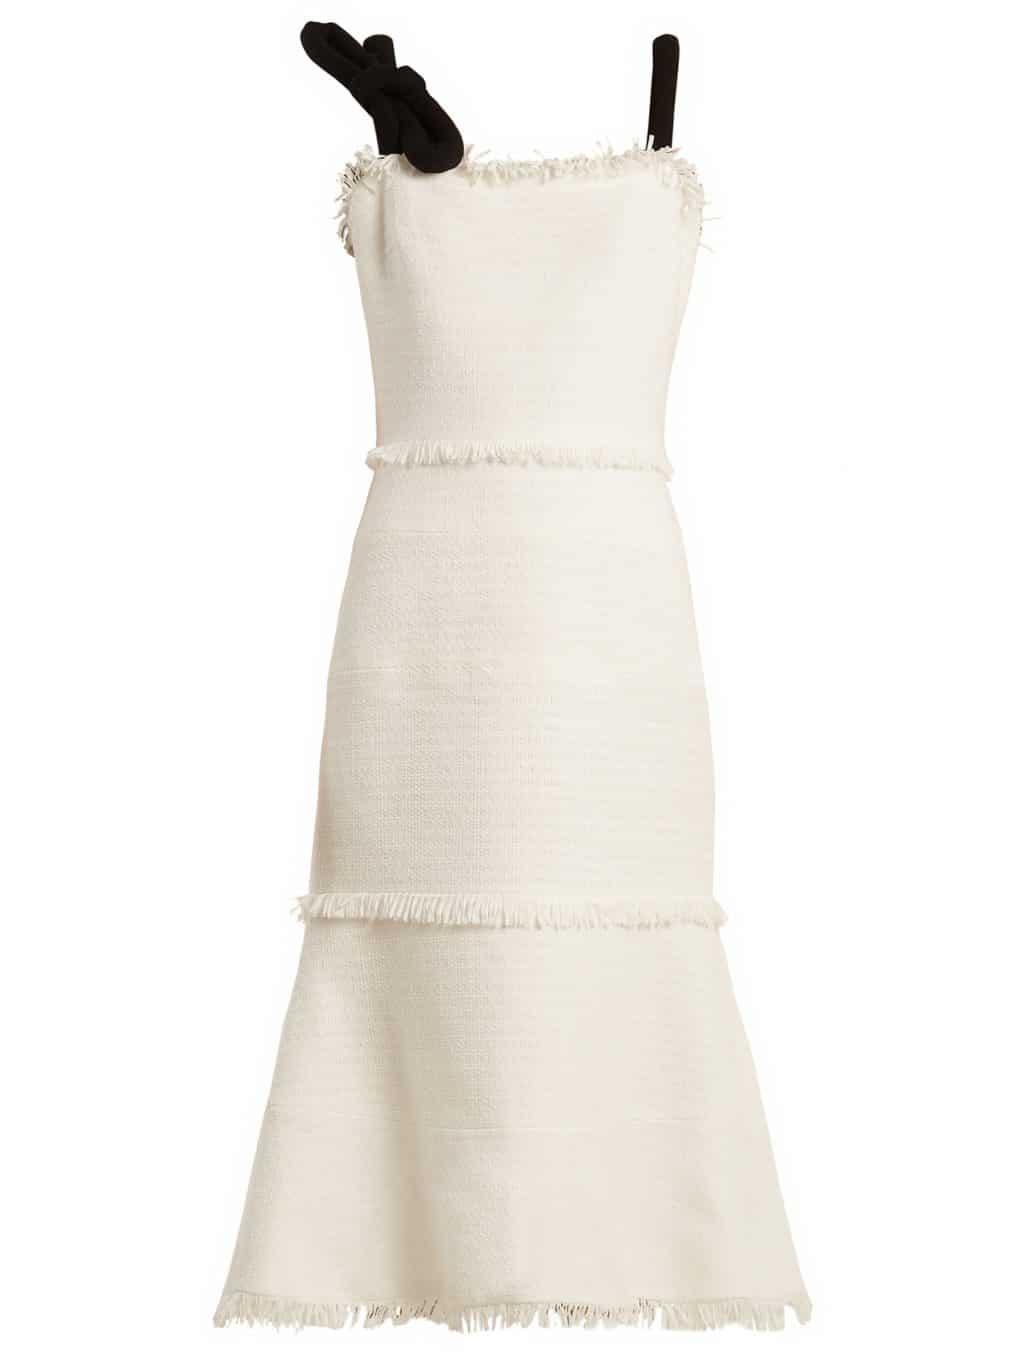 OSCAR DE LA RENTA Fringe Trimmed Sleeveless Tweed Ivory Dress - We ...